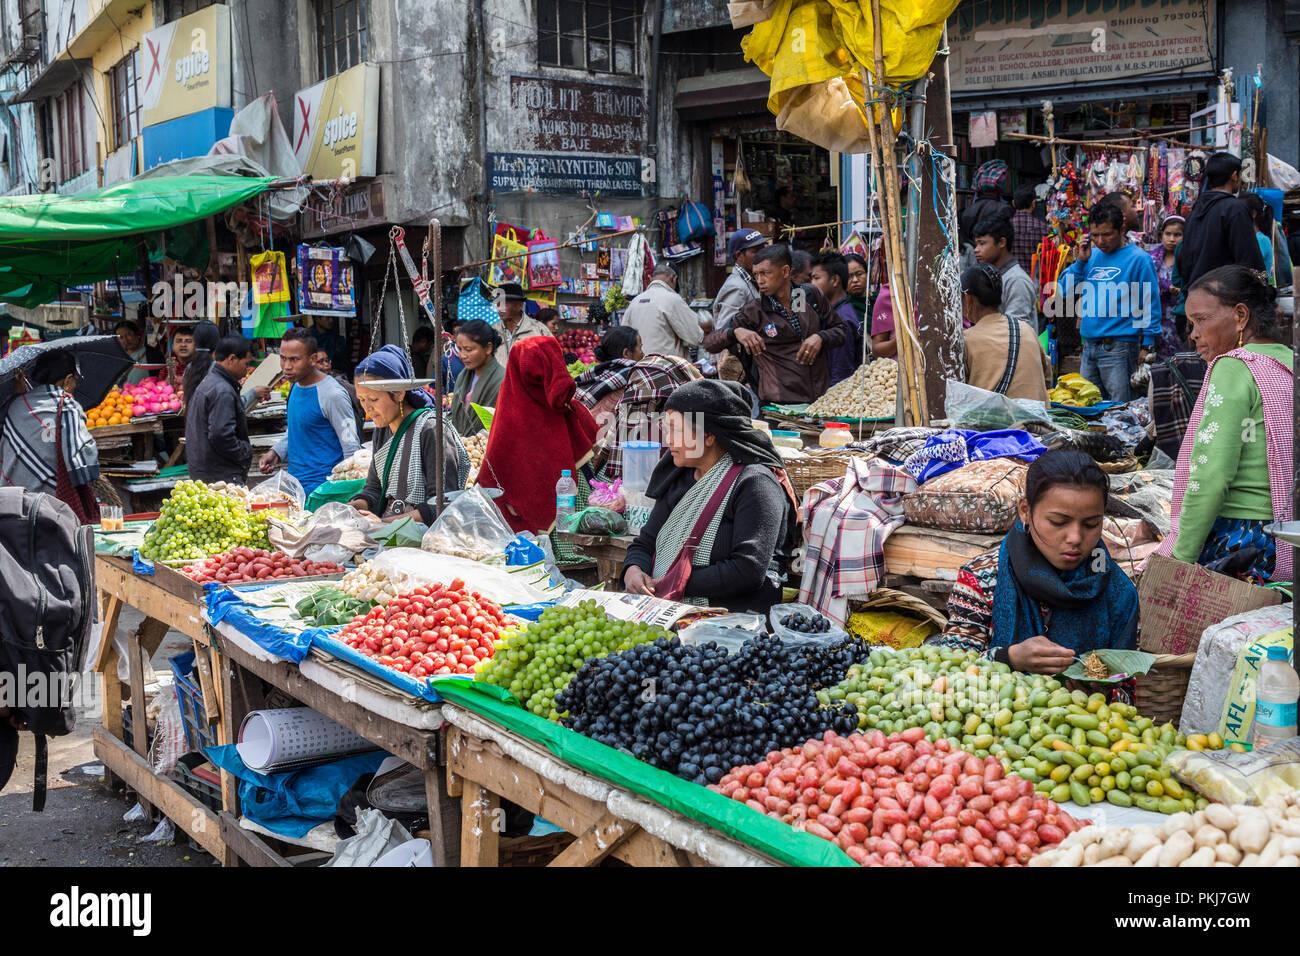 Busy street market selling produce, Shillong, Meghalaya, India - Stock Image